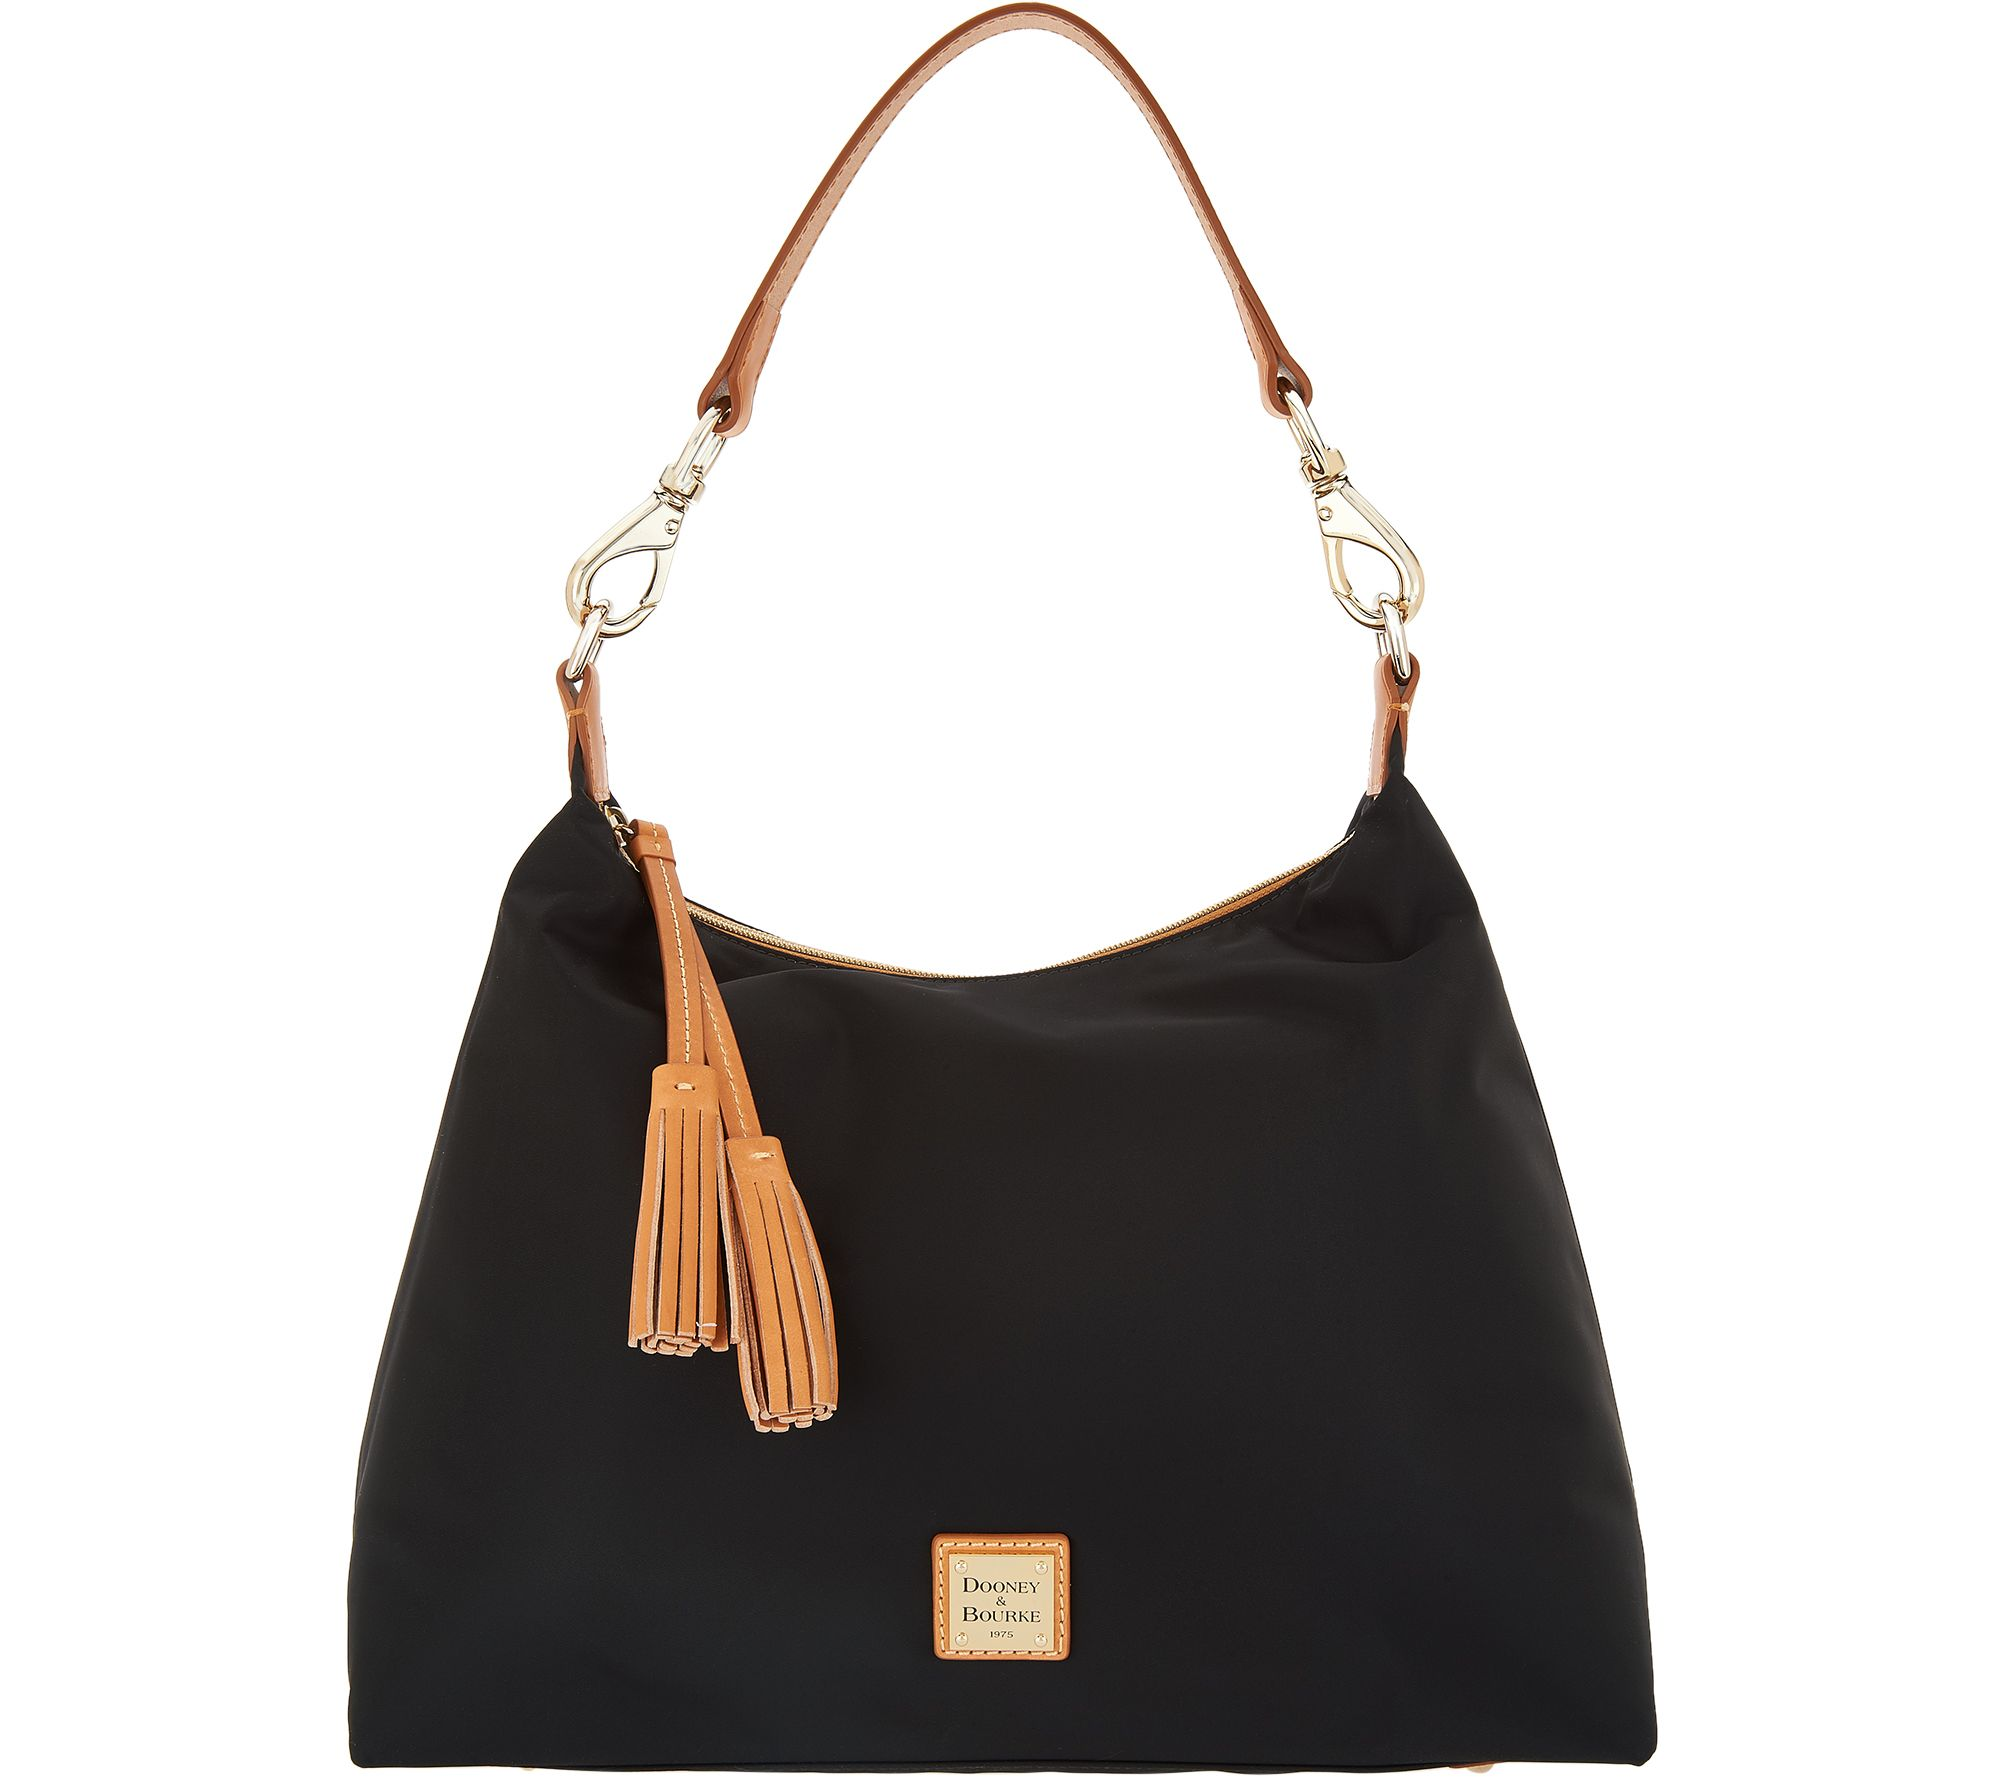 b26c8c58f161 Dooney   Bourke Nylon Hobo Handbag- Juliette - Page 1 — QVC.com